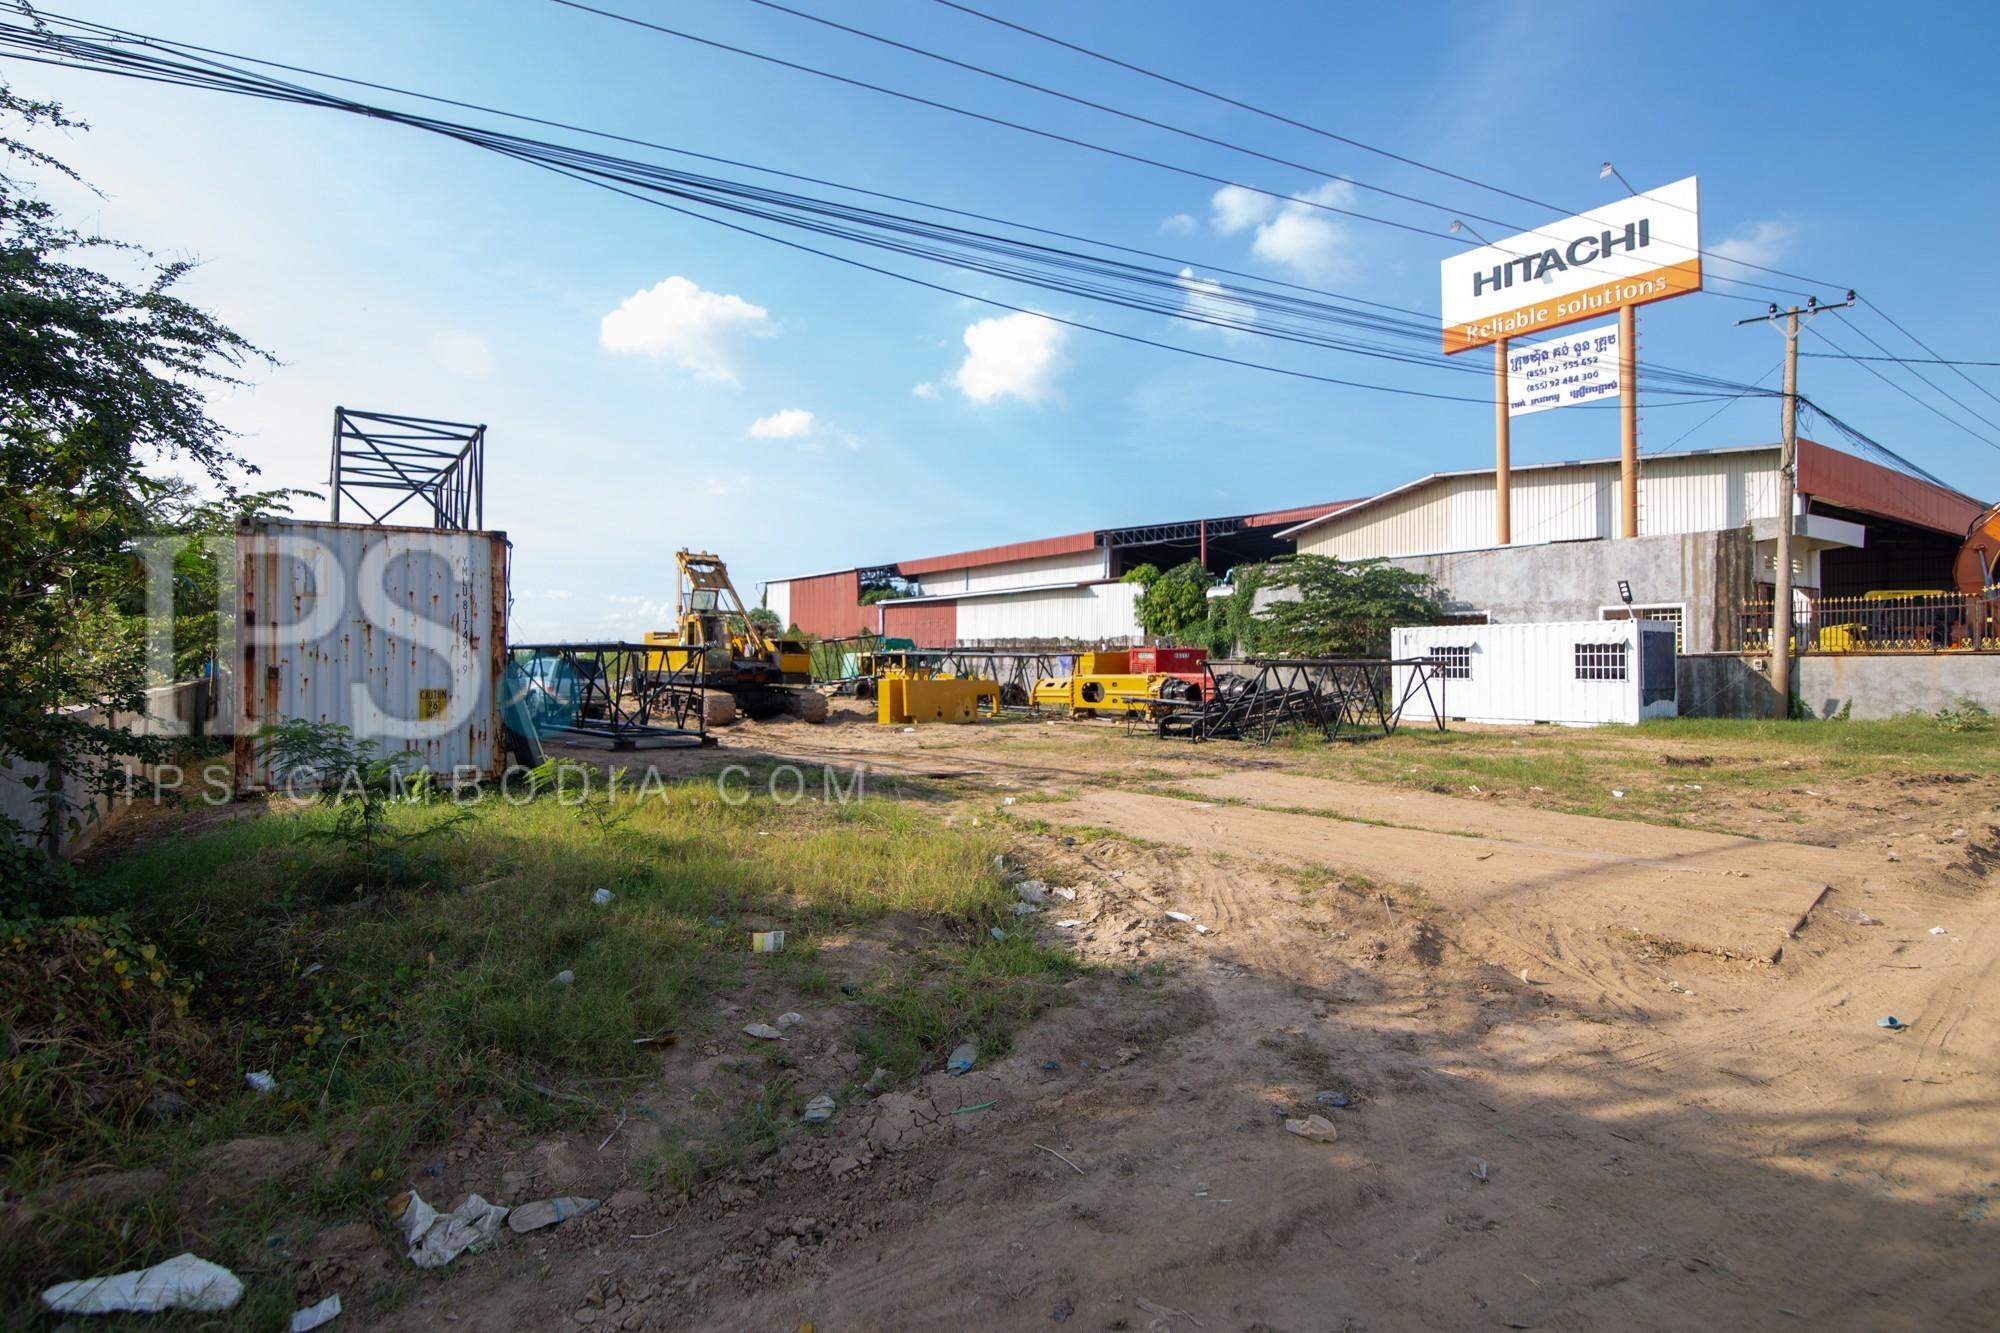 52522 Sqm Land For Sale - Prek Leap, Chroy Changvar, Phnom Penh